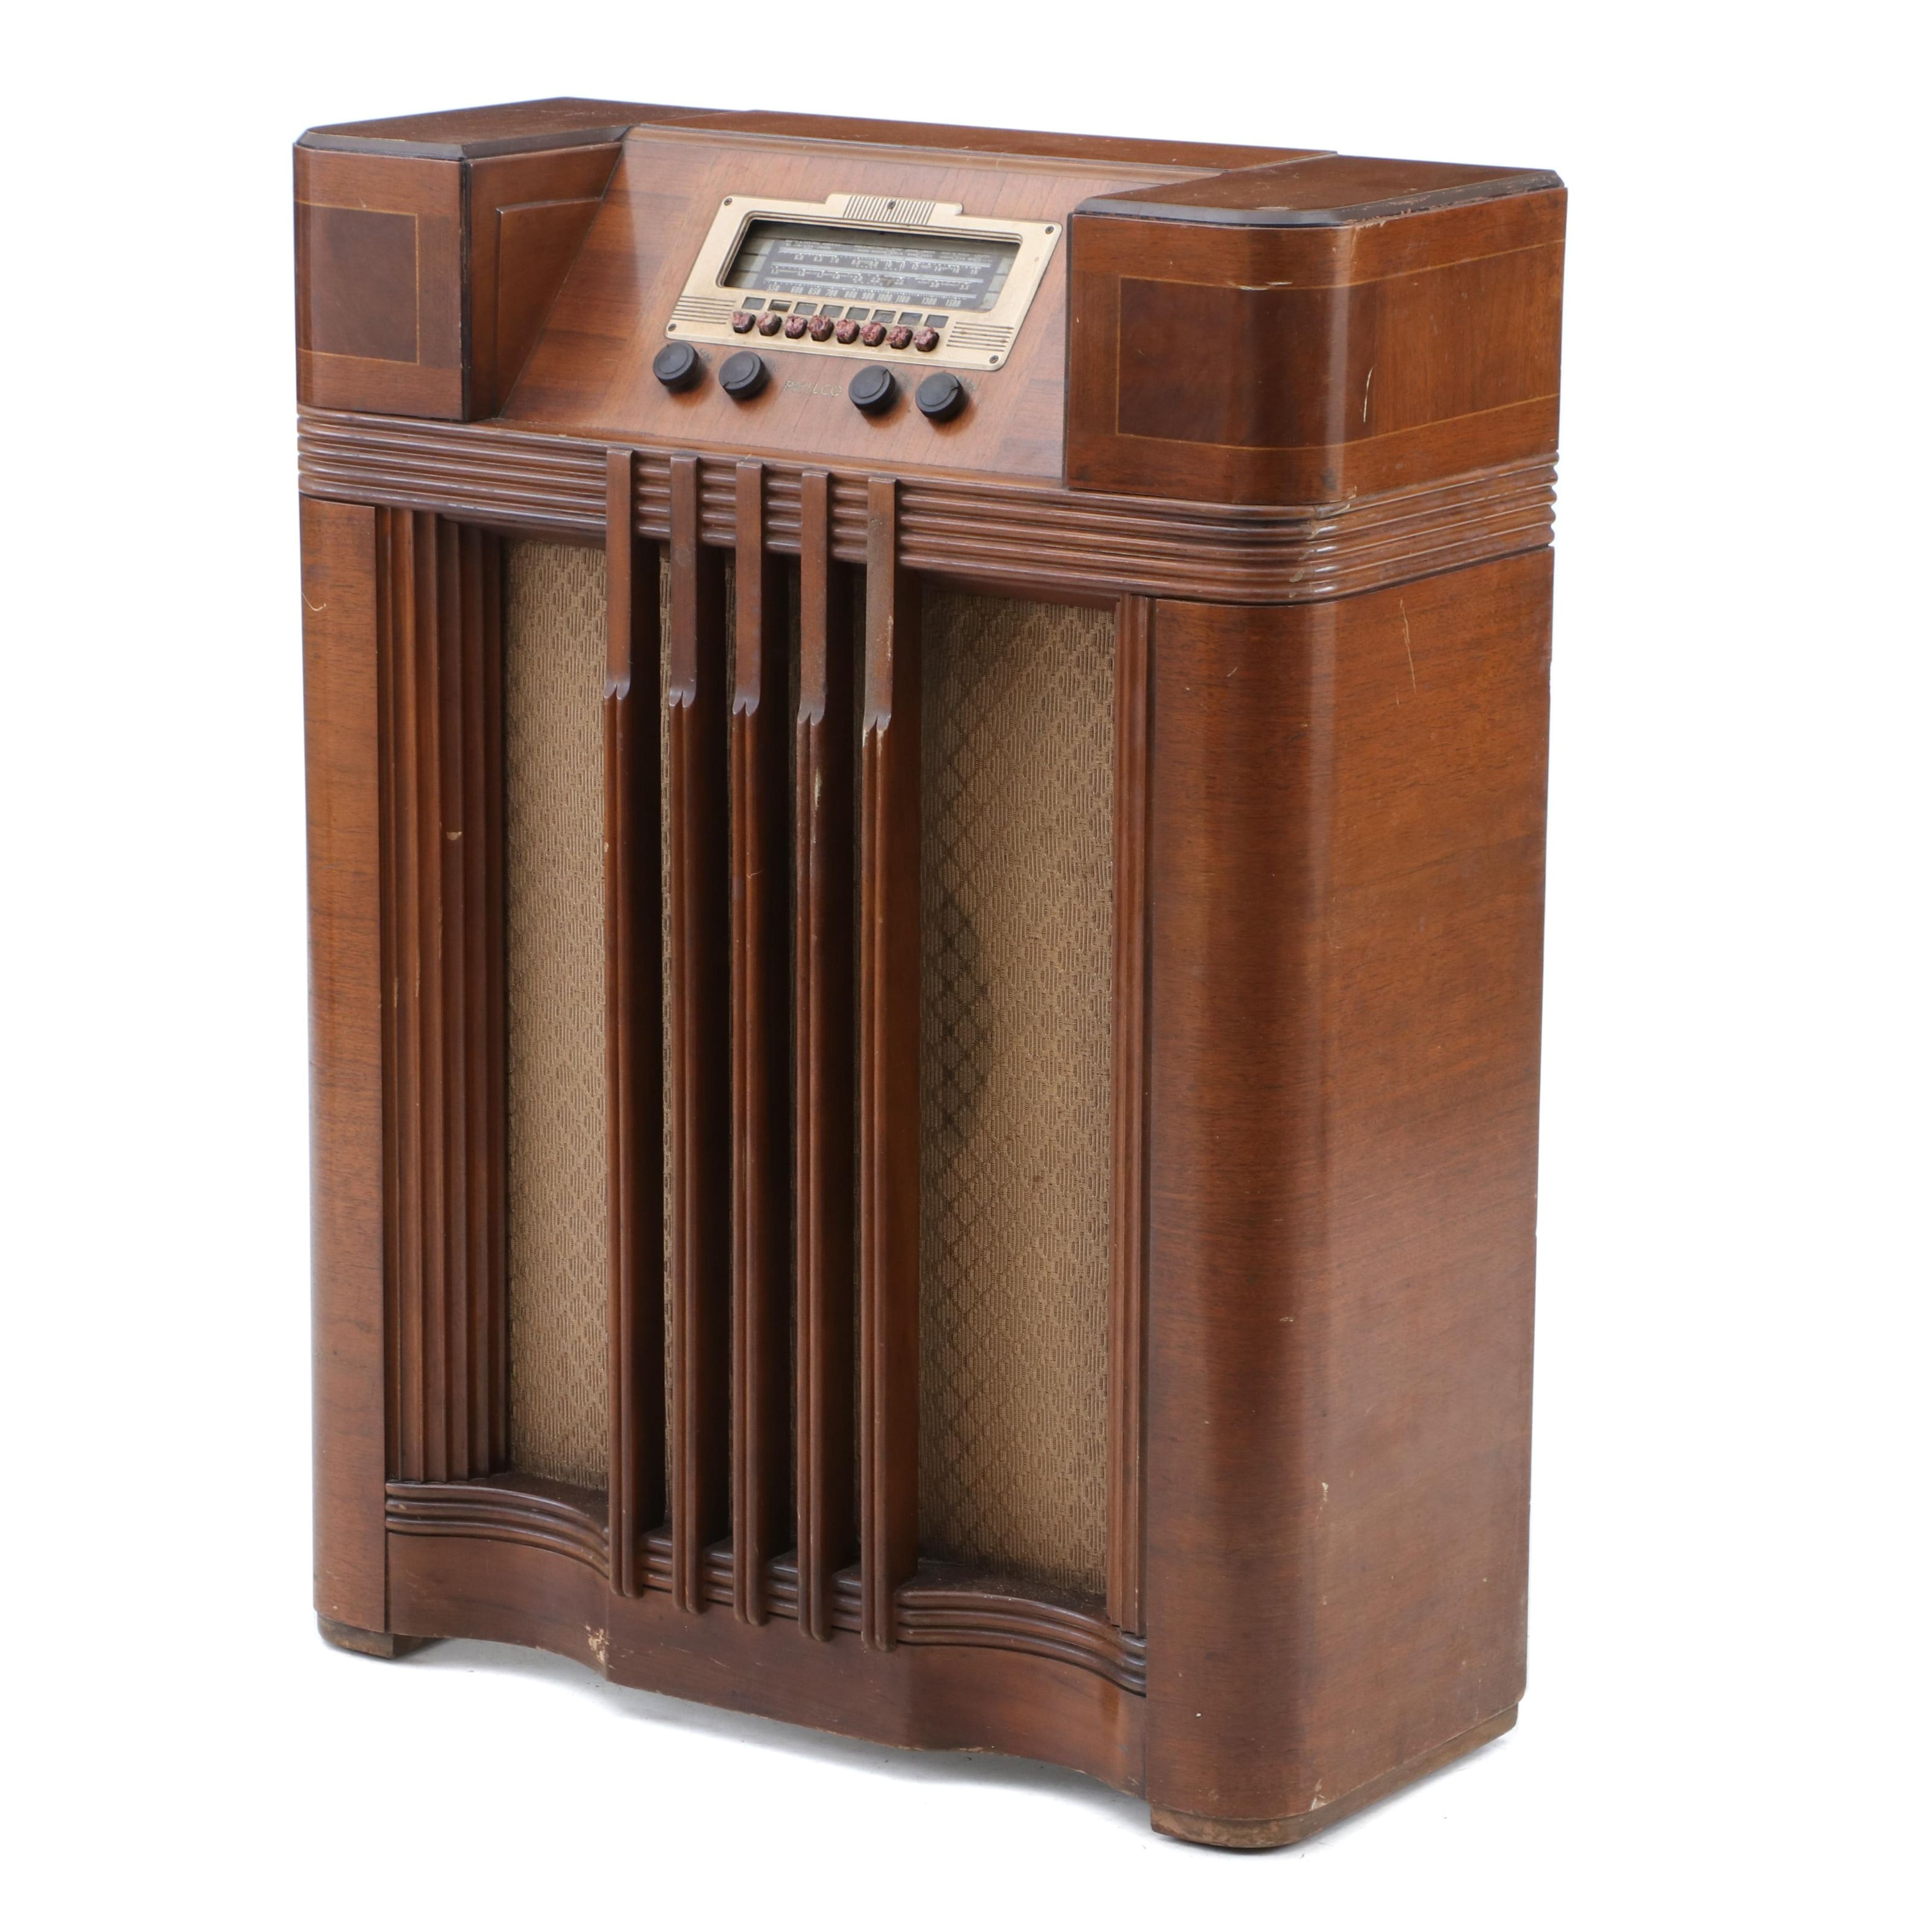 Art-Deco-Style 1930s-1940s Philco Model 40-185 Tube Console Radio